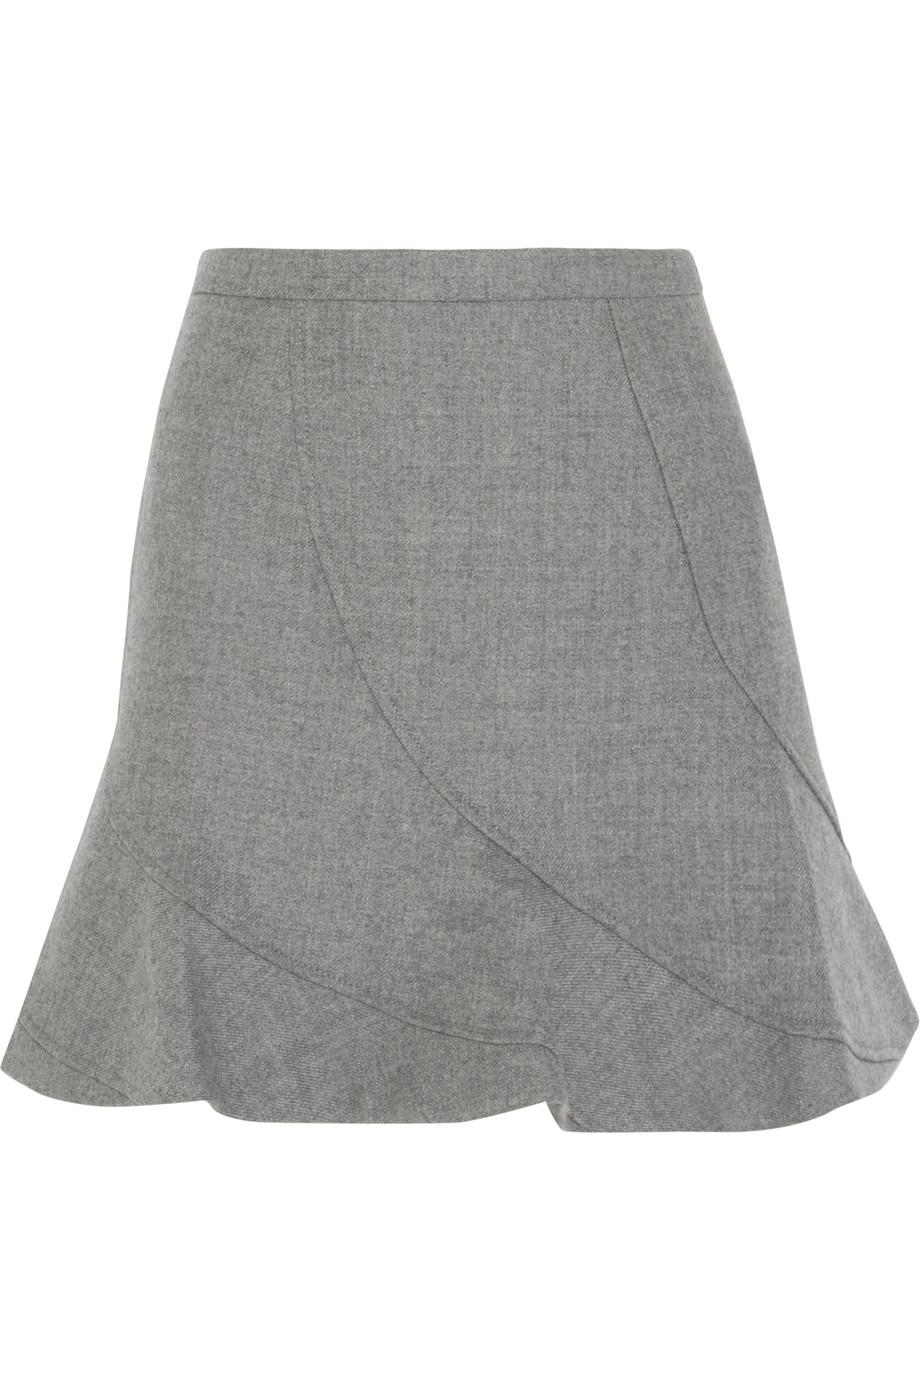 J.Crew Flared Wool Mini Skirt, Light Gray, Women's, Size: 6